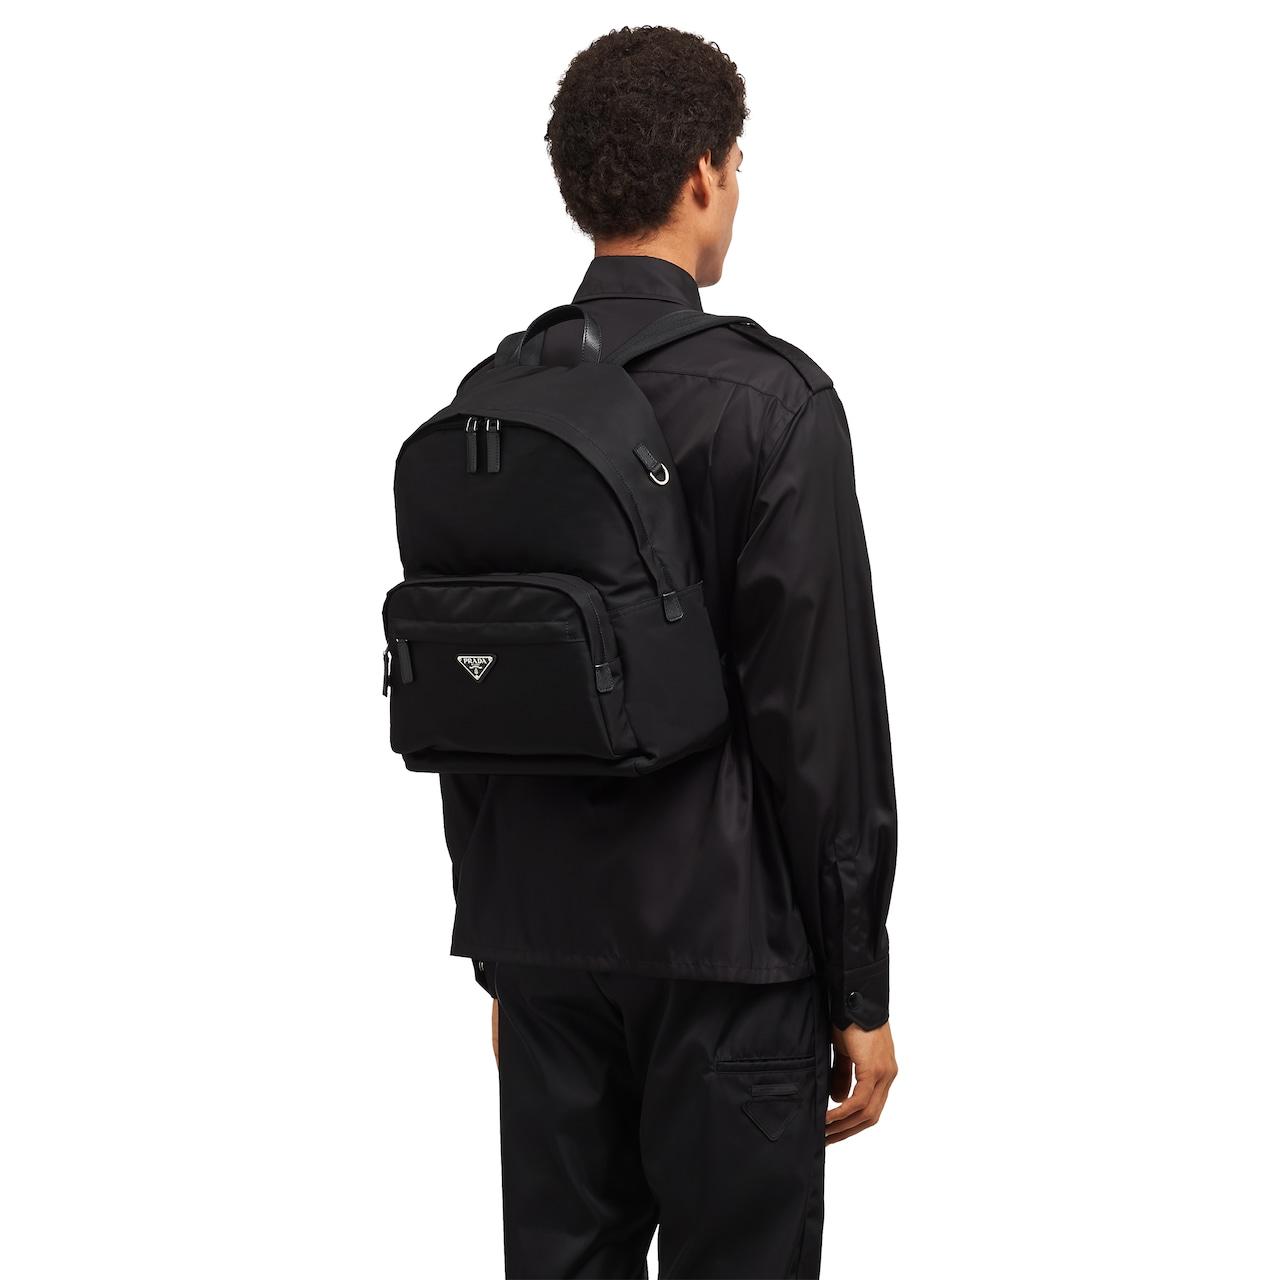 Prada Nylon Backpack 2